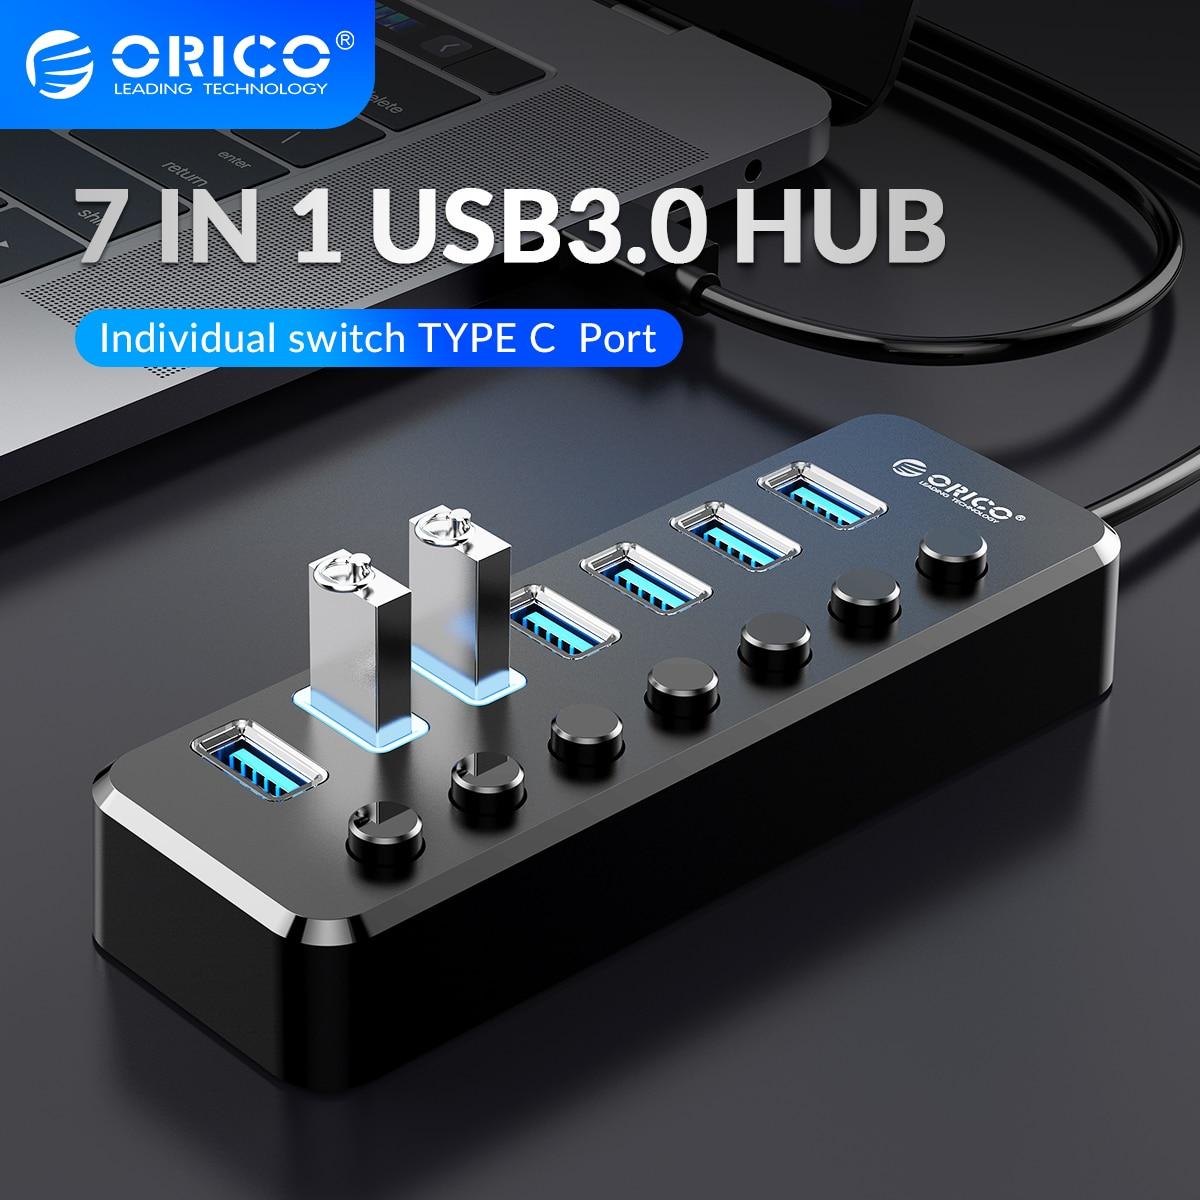 ORICO-Adaptador de concentrador USB 3,0, multipuerto, tipo C, interfaz de ordenador, 4/7...